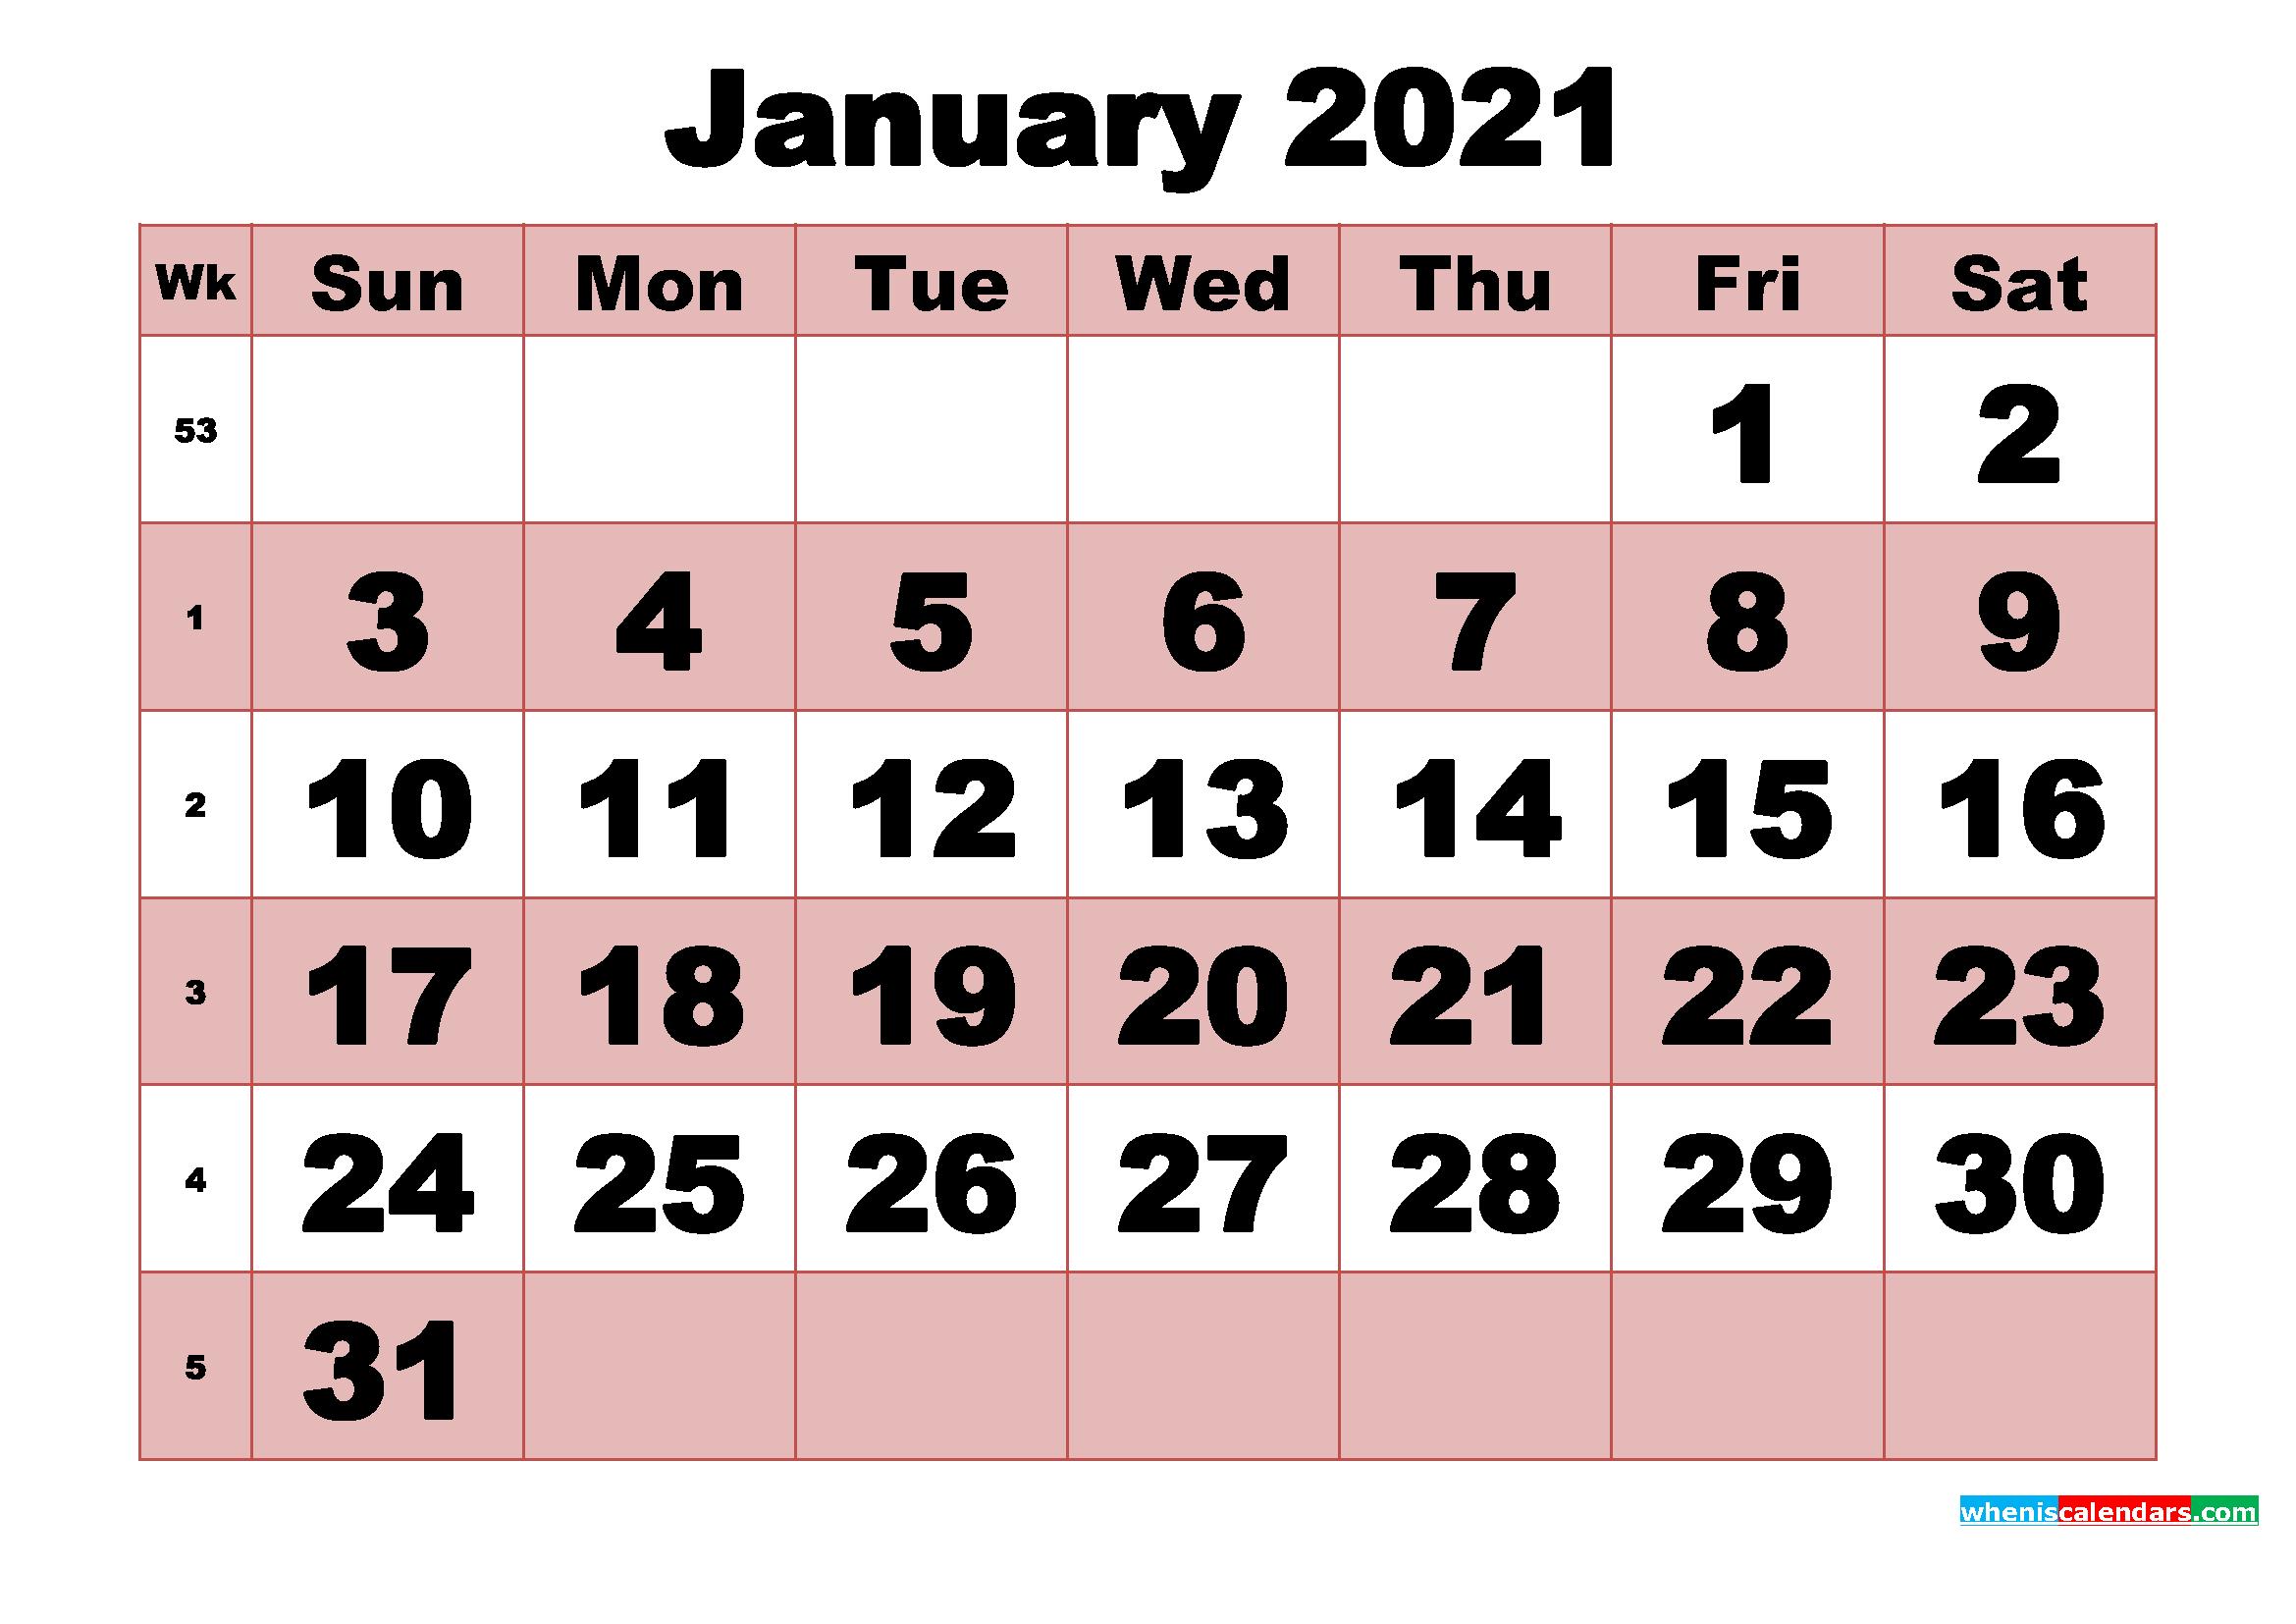 Free Printable Monthly Calendar January 2021 | Free Printable 2020 Calendar With Holidays